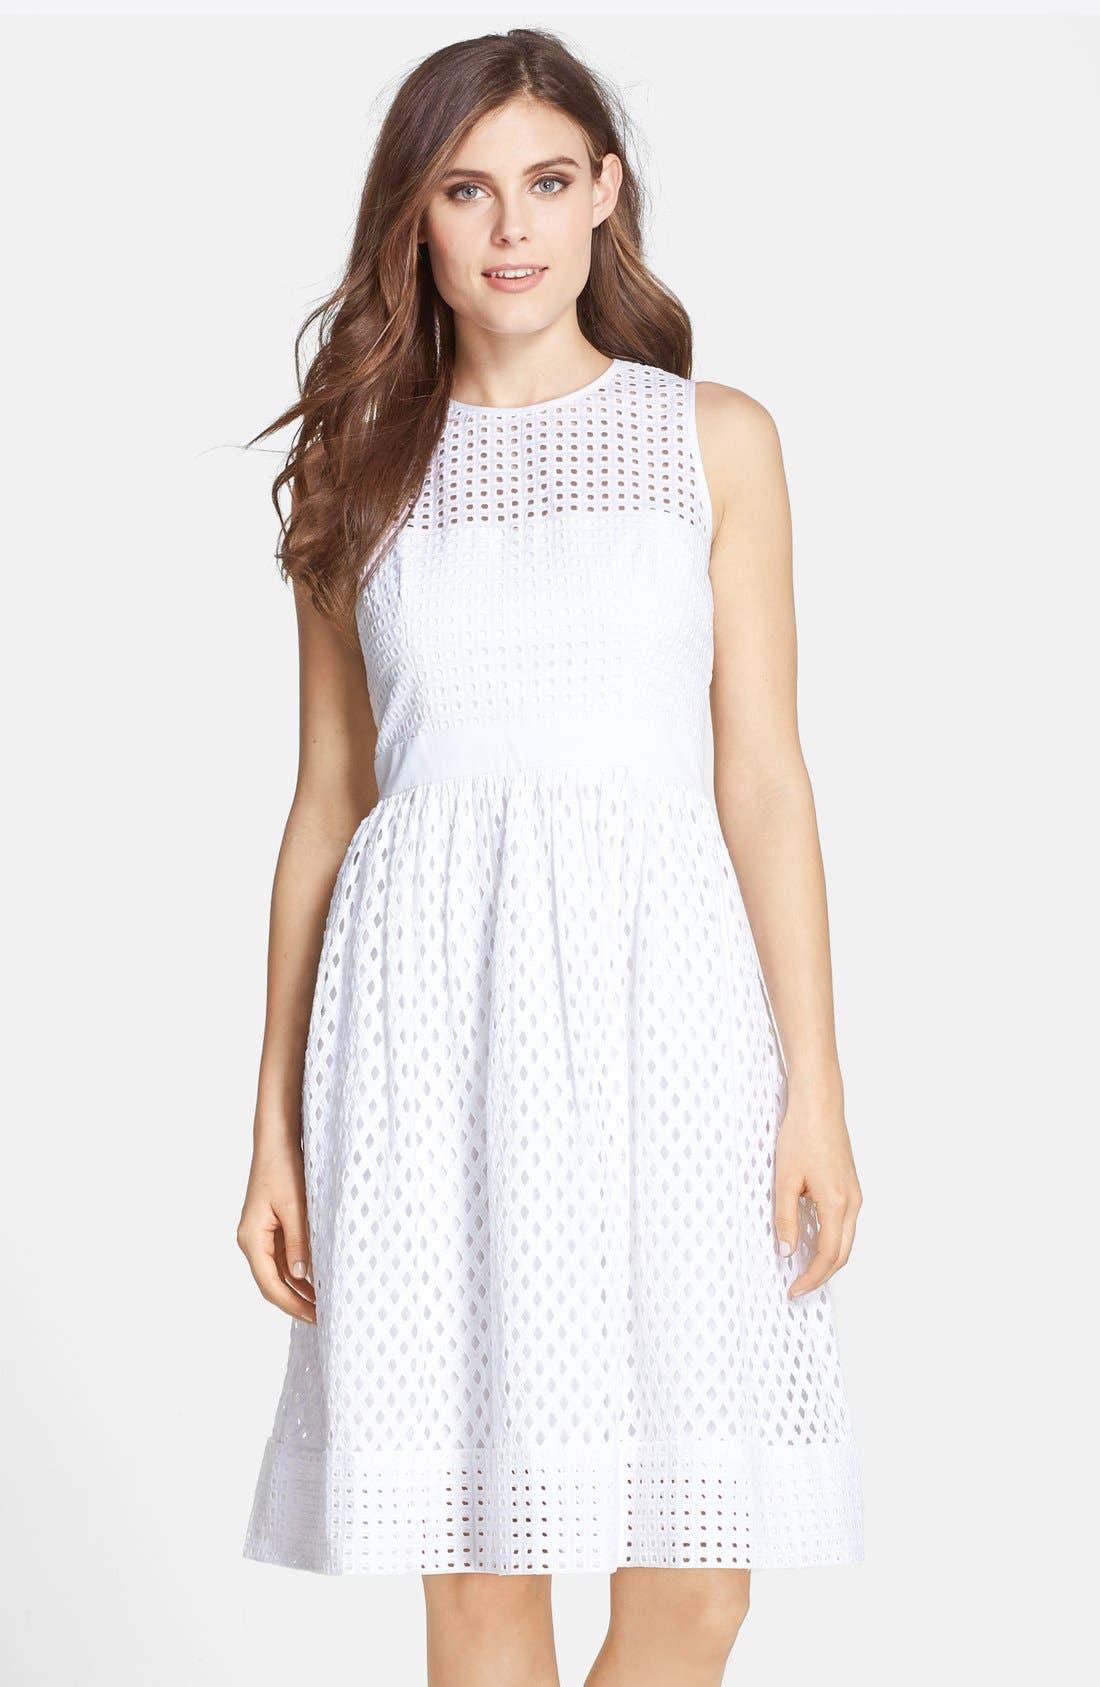 Alternate Image 1 Selected - Eliza J Cotton Eyelet Fit & Flare Dress (Regular & Petite)